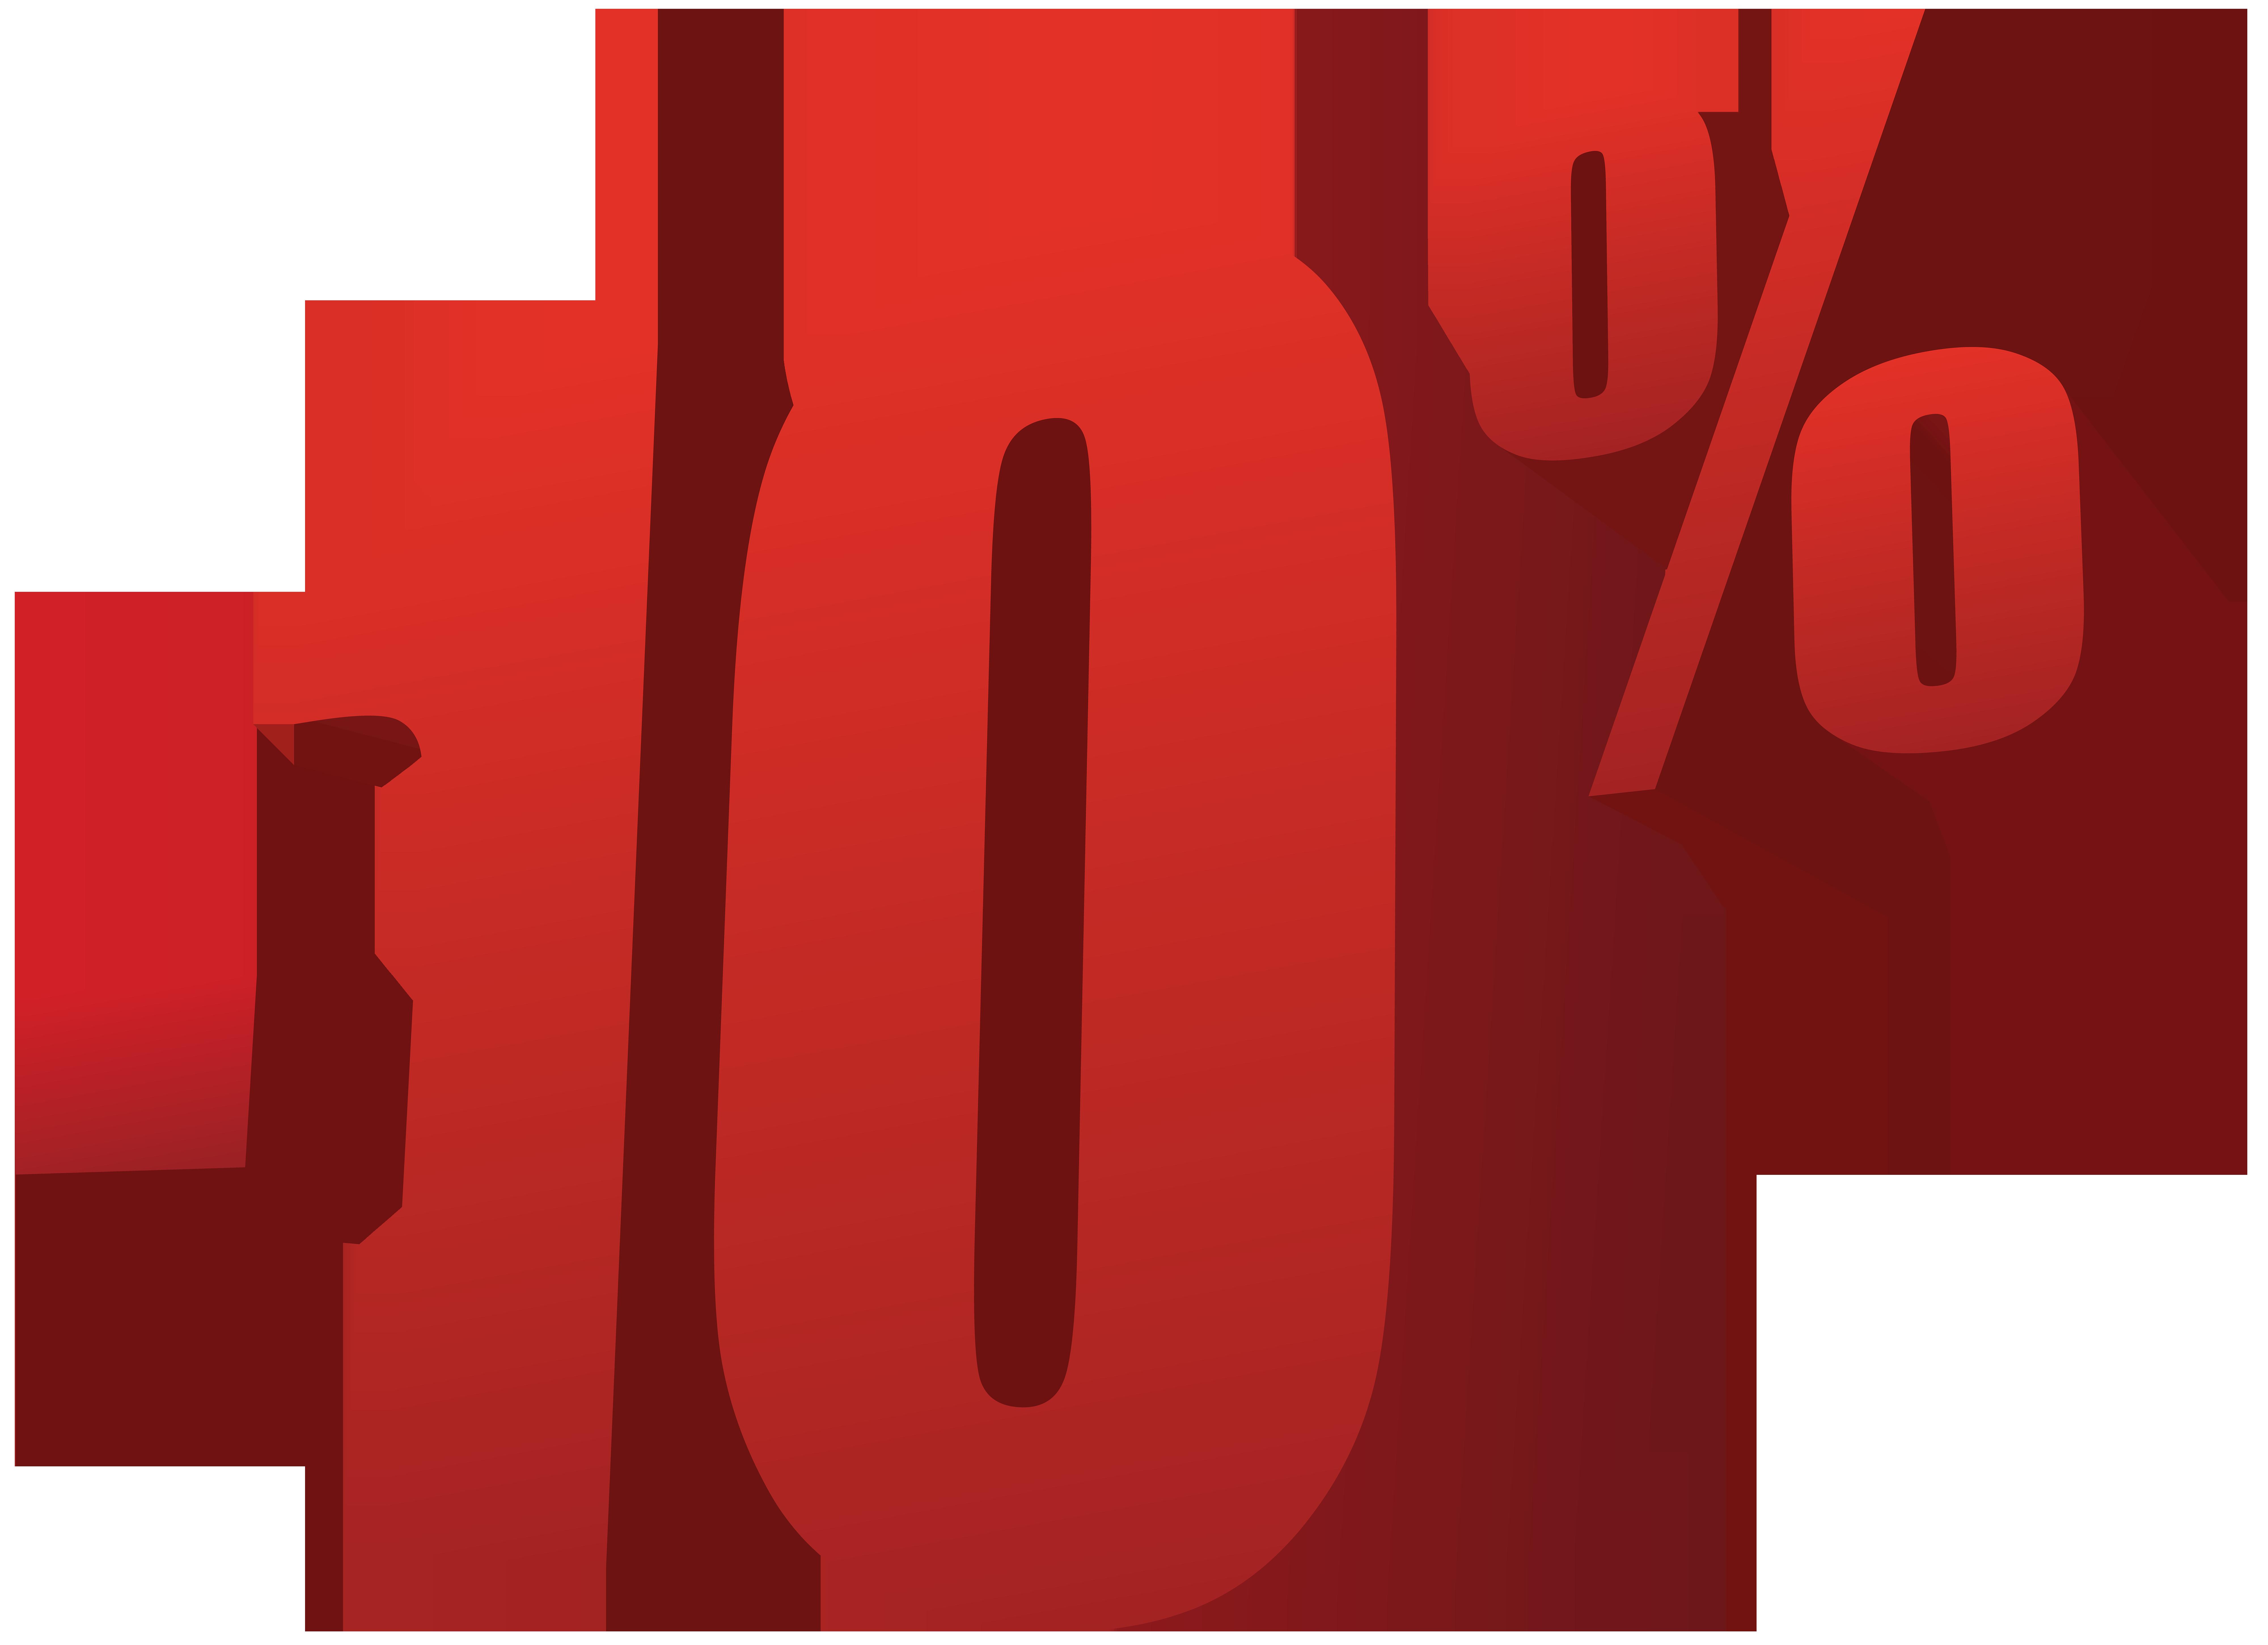 10% Off Sale PNG Transparent Image.